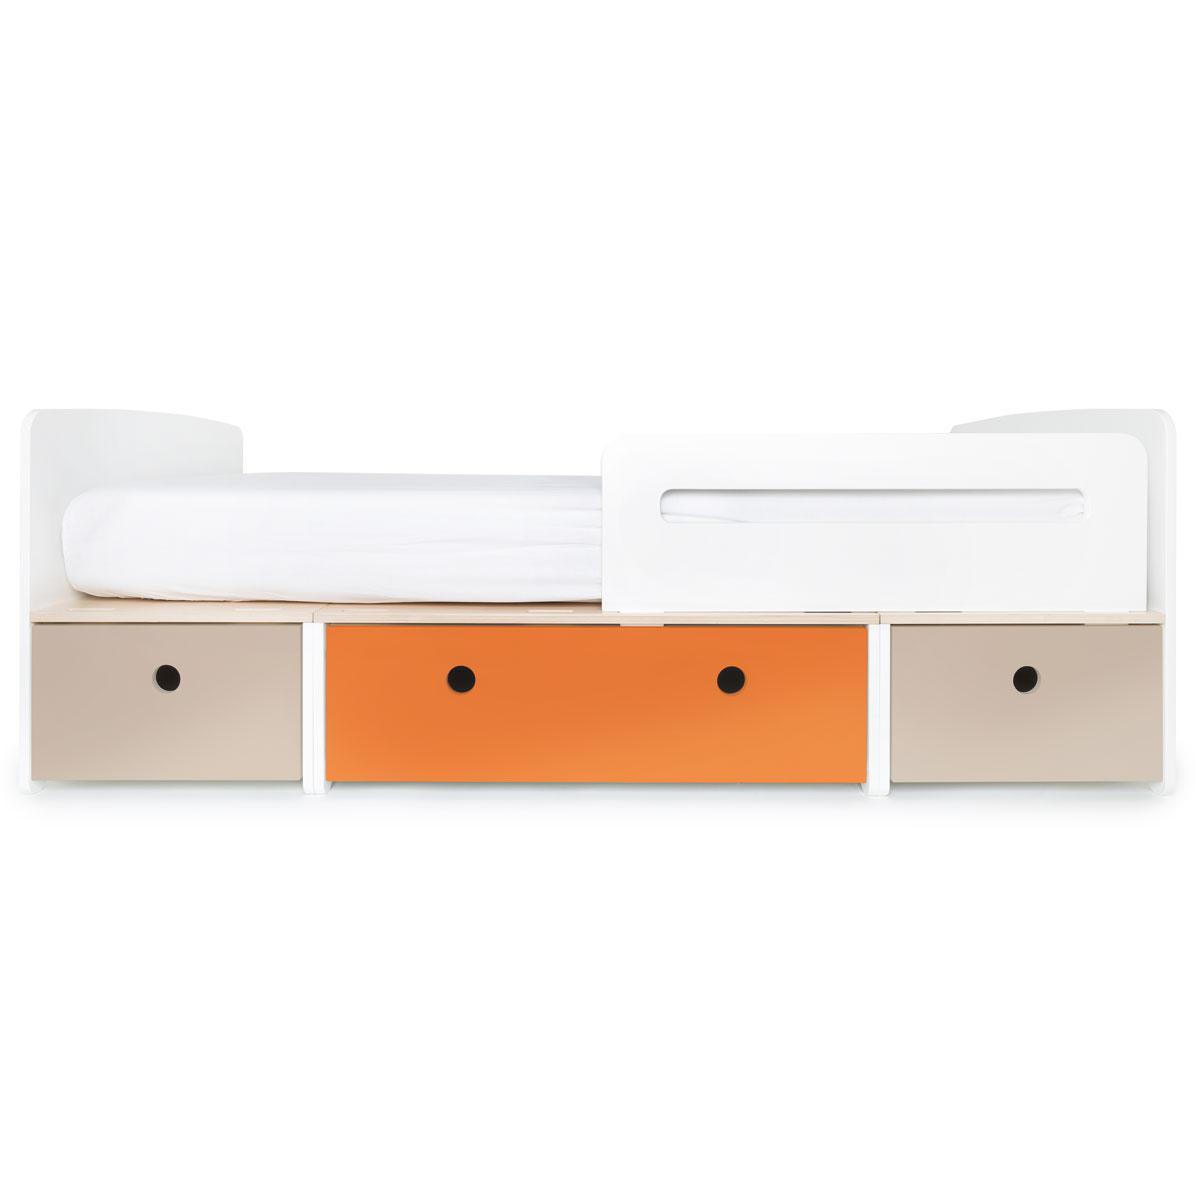 Kinderbett 90x200cm COLORFLEX warm grey-pure orange-warm grey